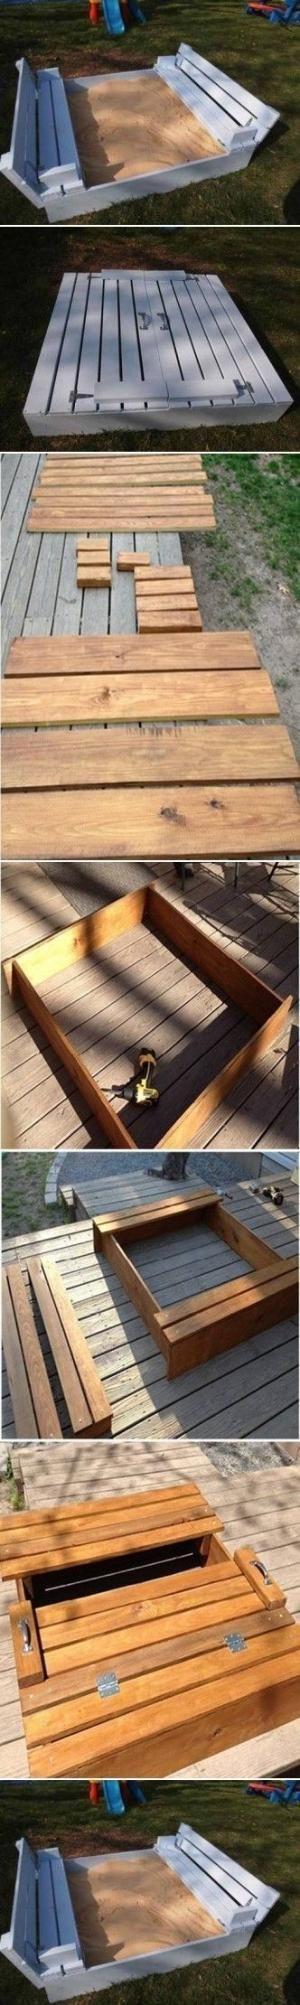 DIY Sandbox DIY Projects by yemaja.rogers